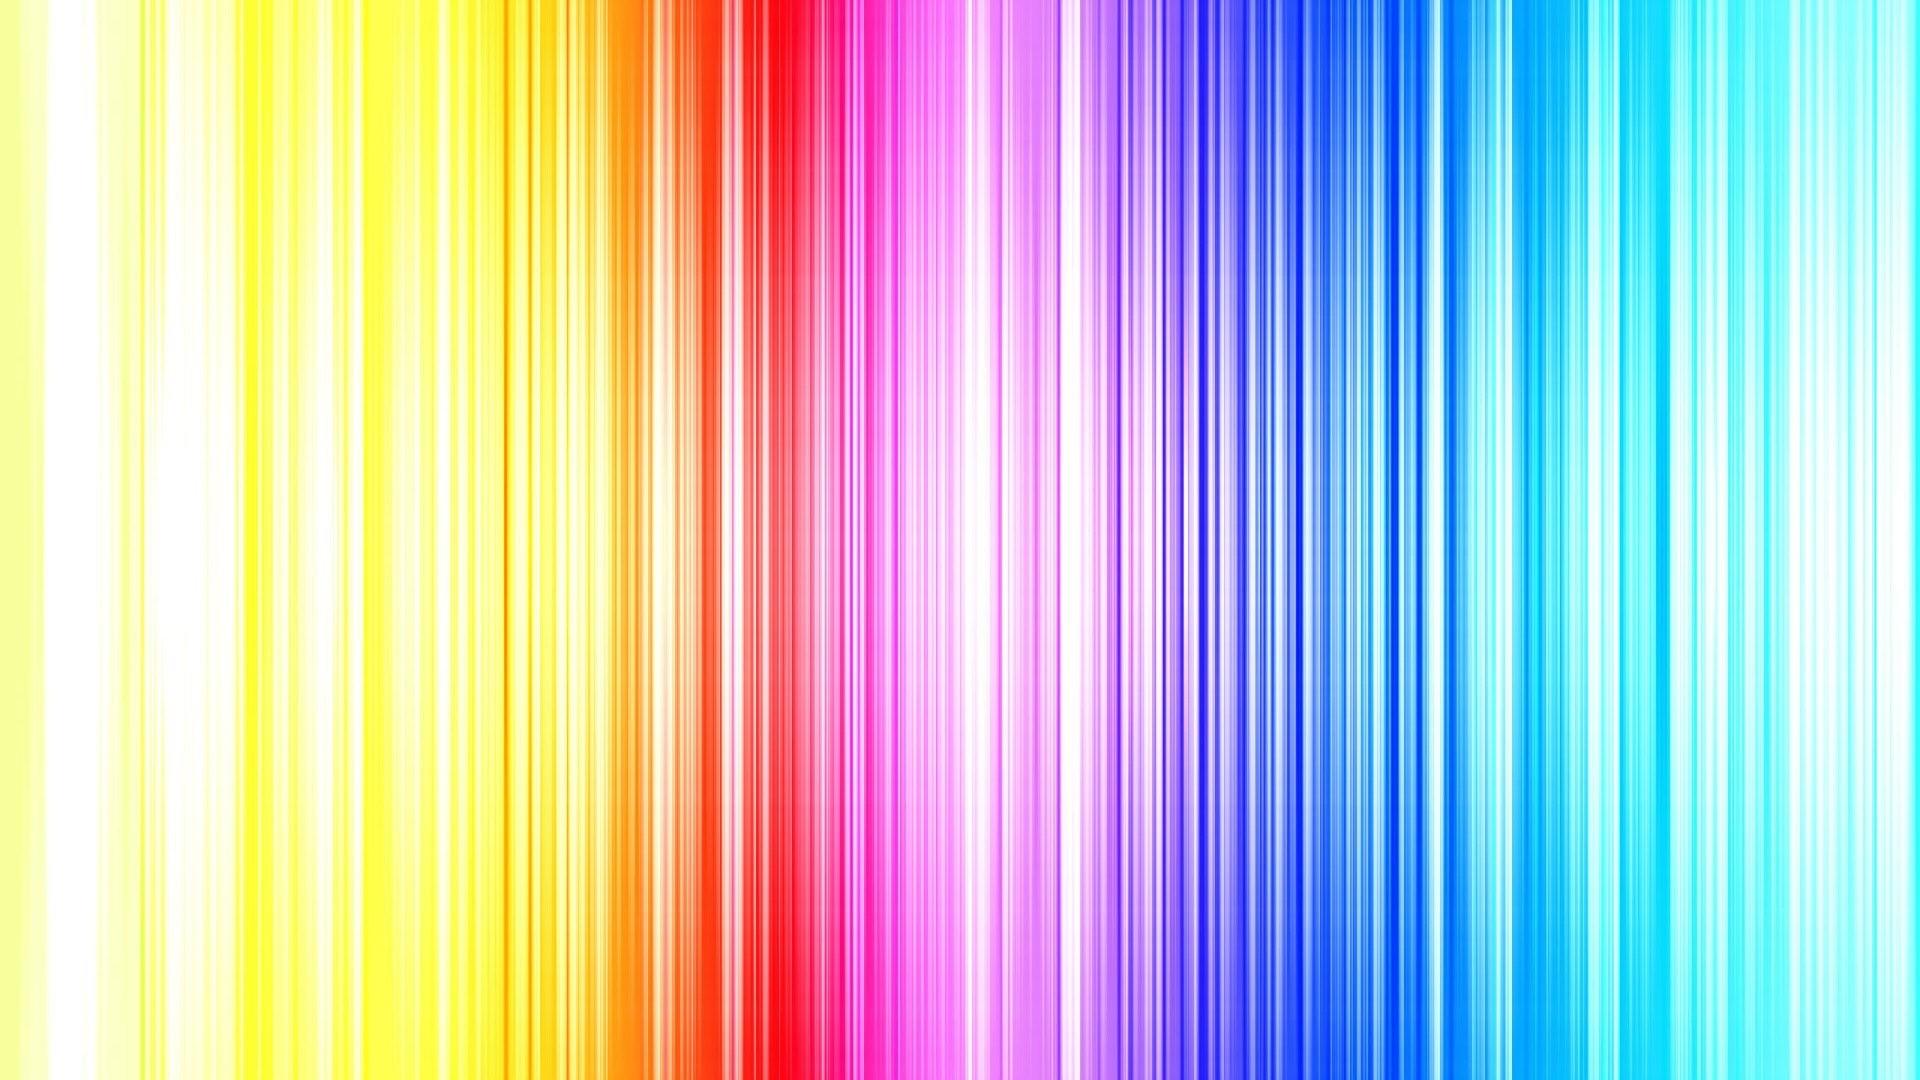 Bright Image